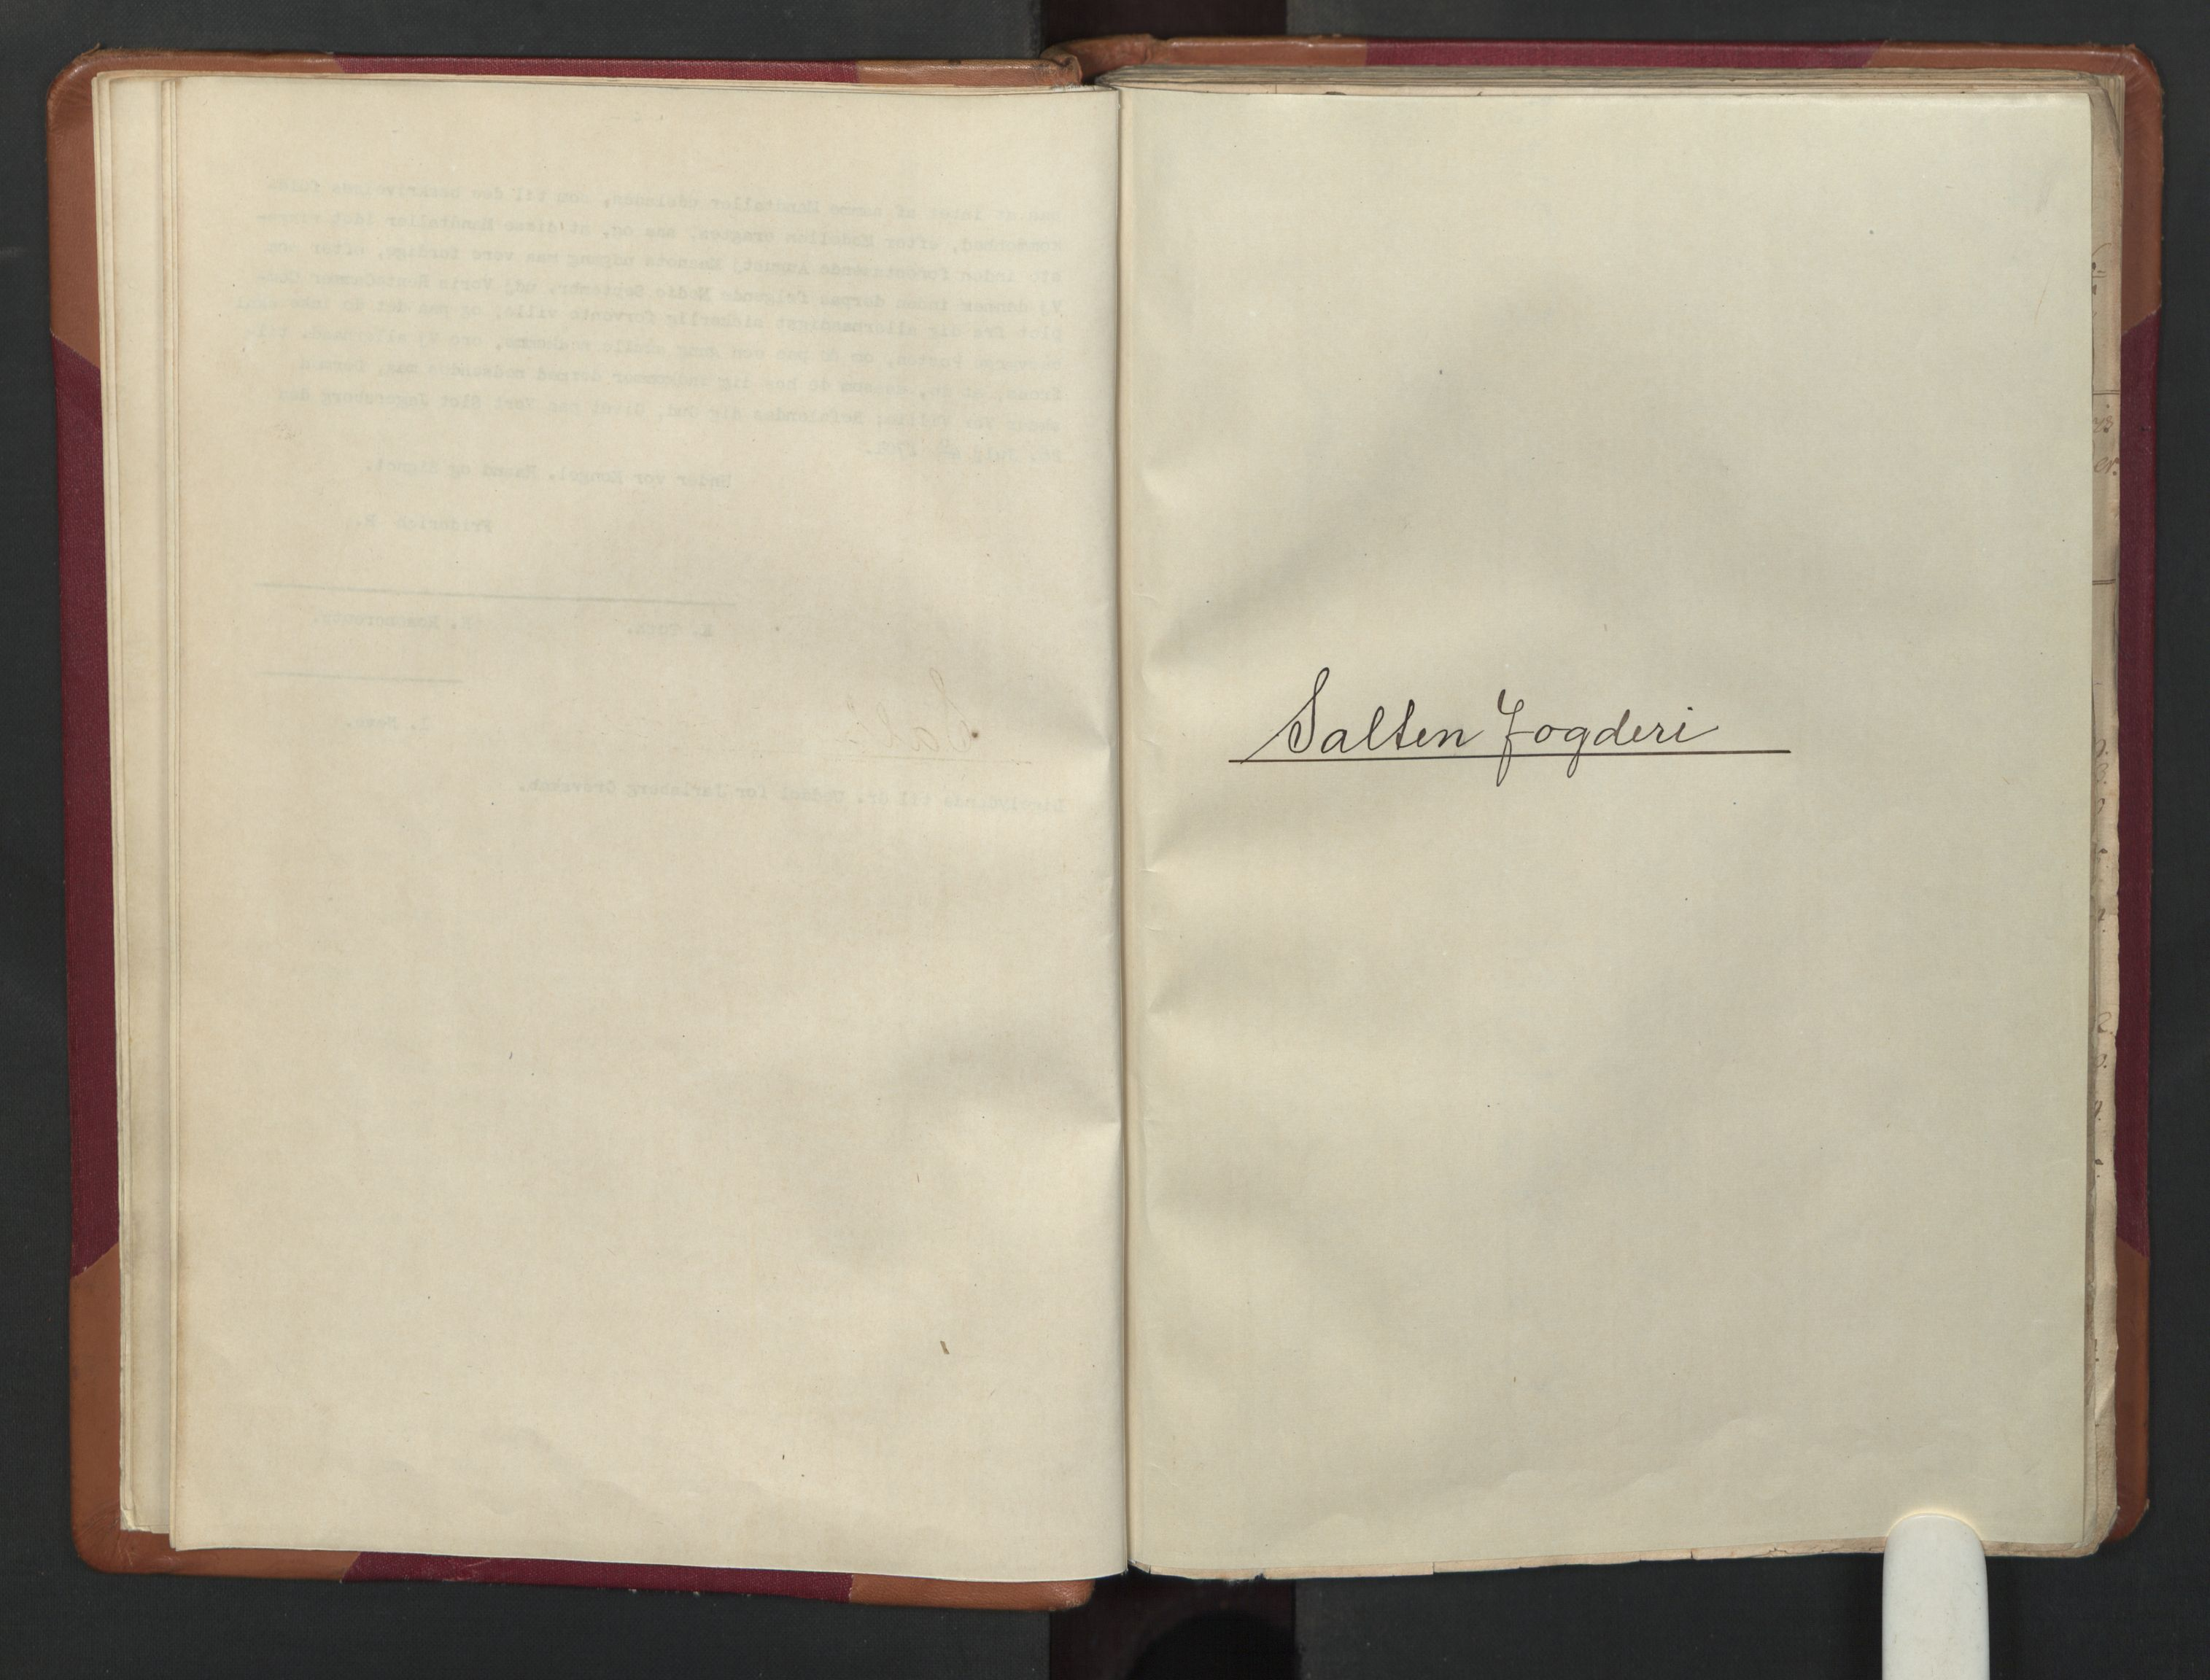 RA, Manntallet 1701, nr. 17: Salten fogderi, 1701, s. upaginert